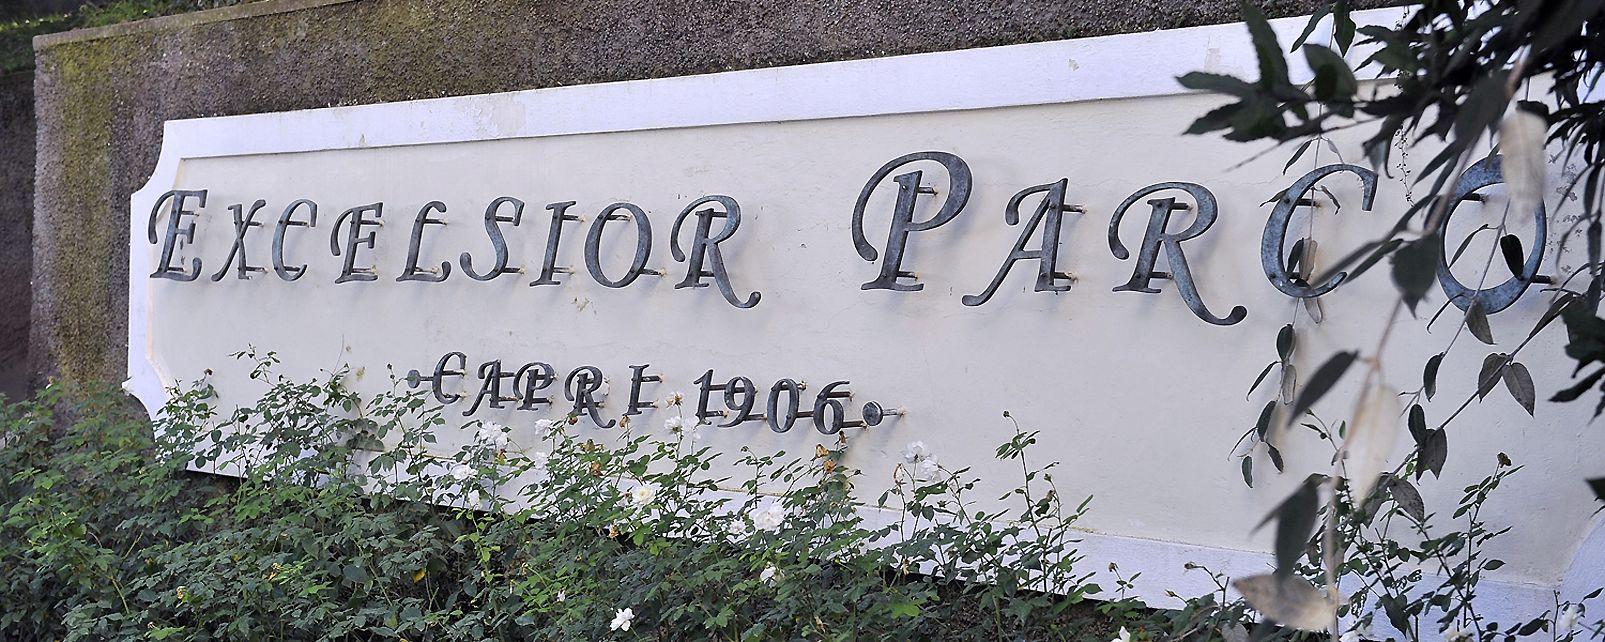 Hotel Excelsior Parco